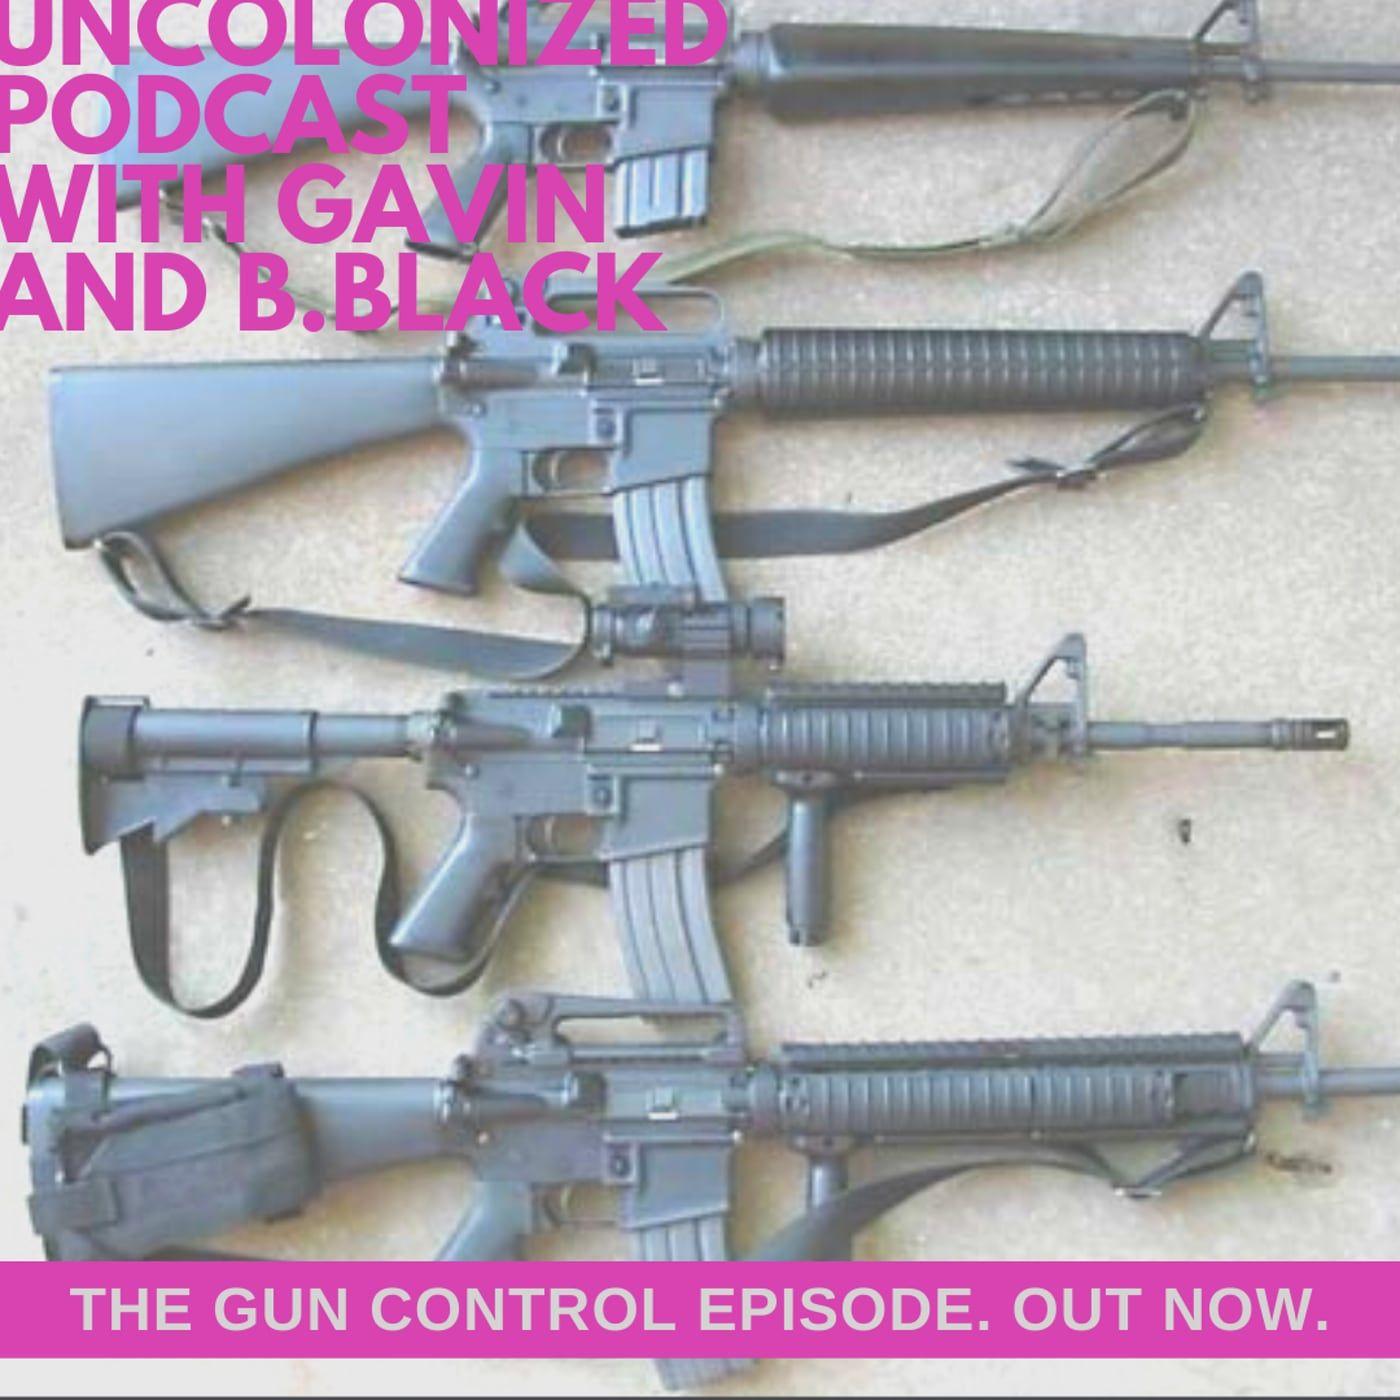 S04E30 – Gun Control and Emotional Labour